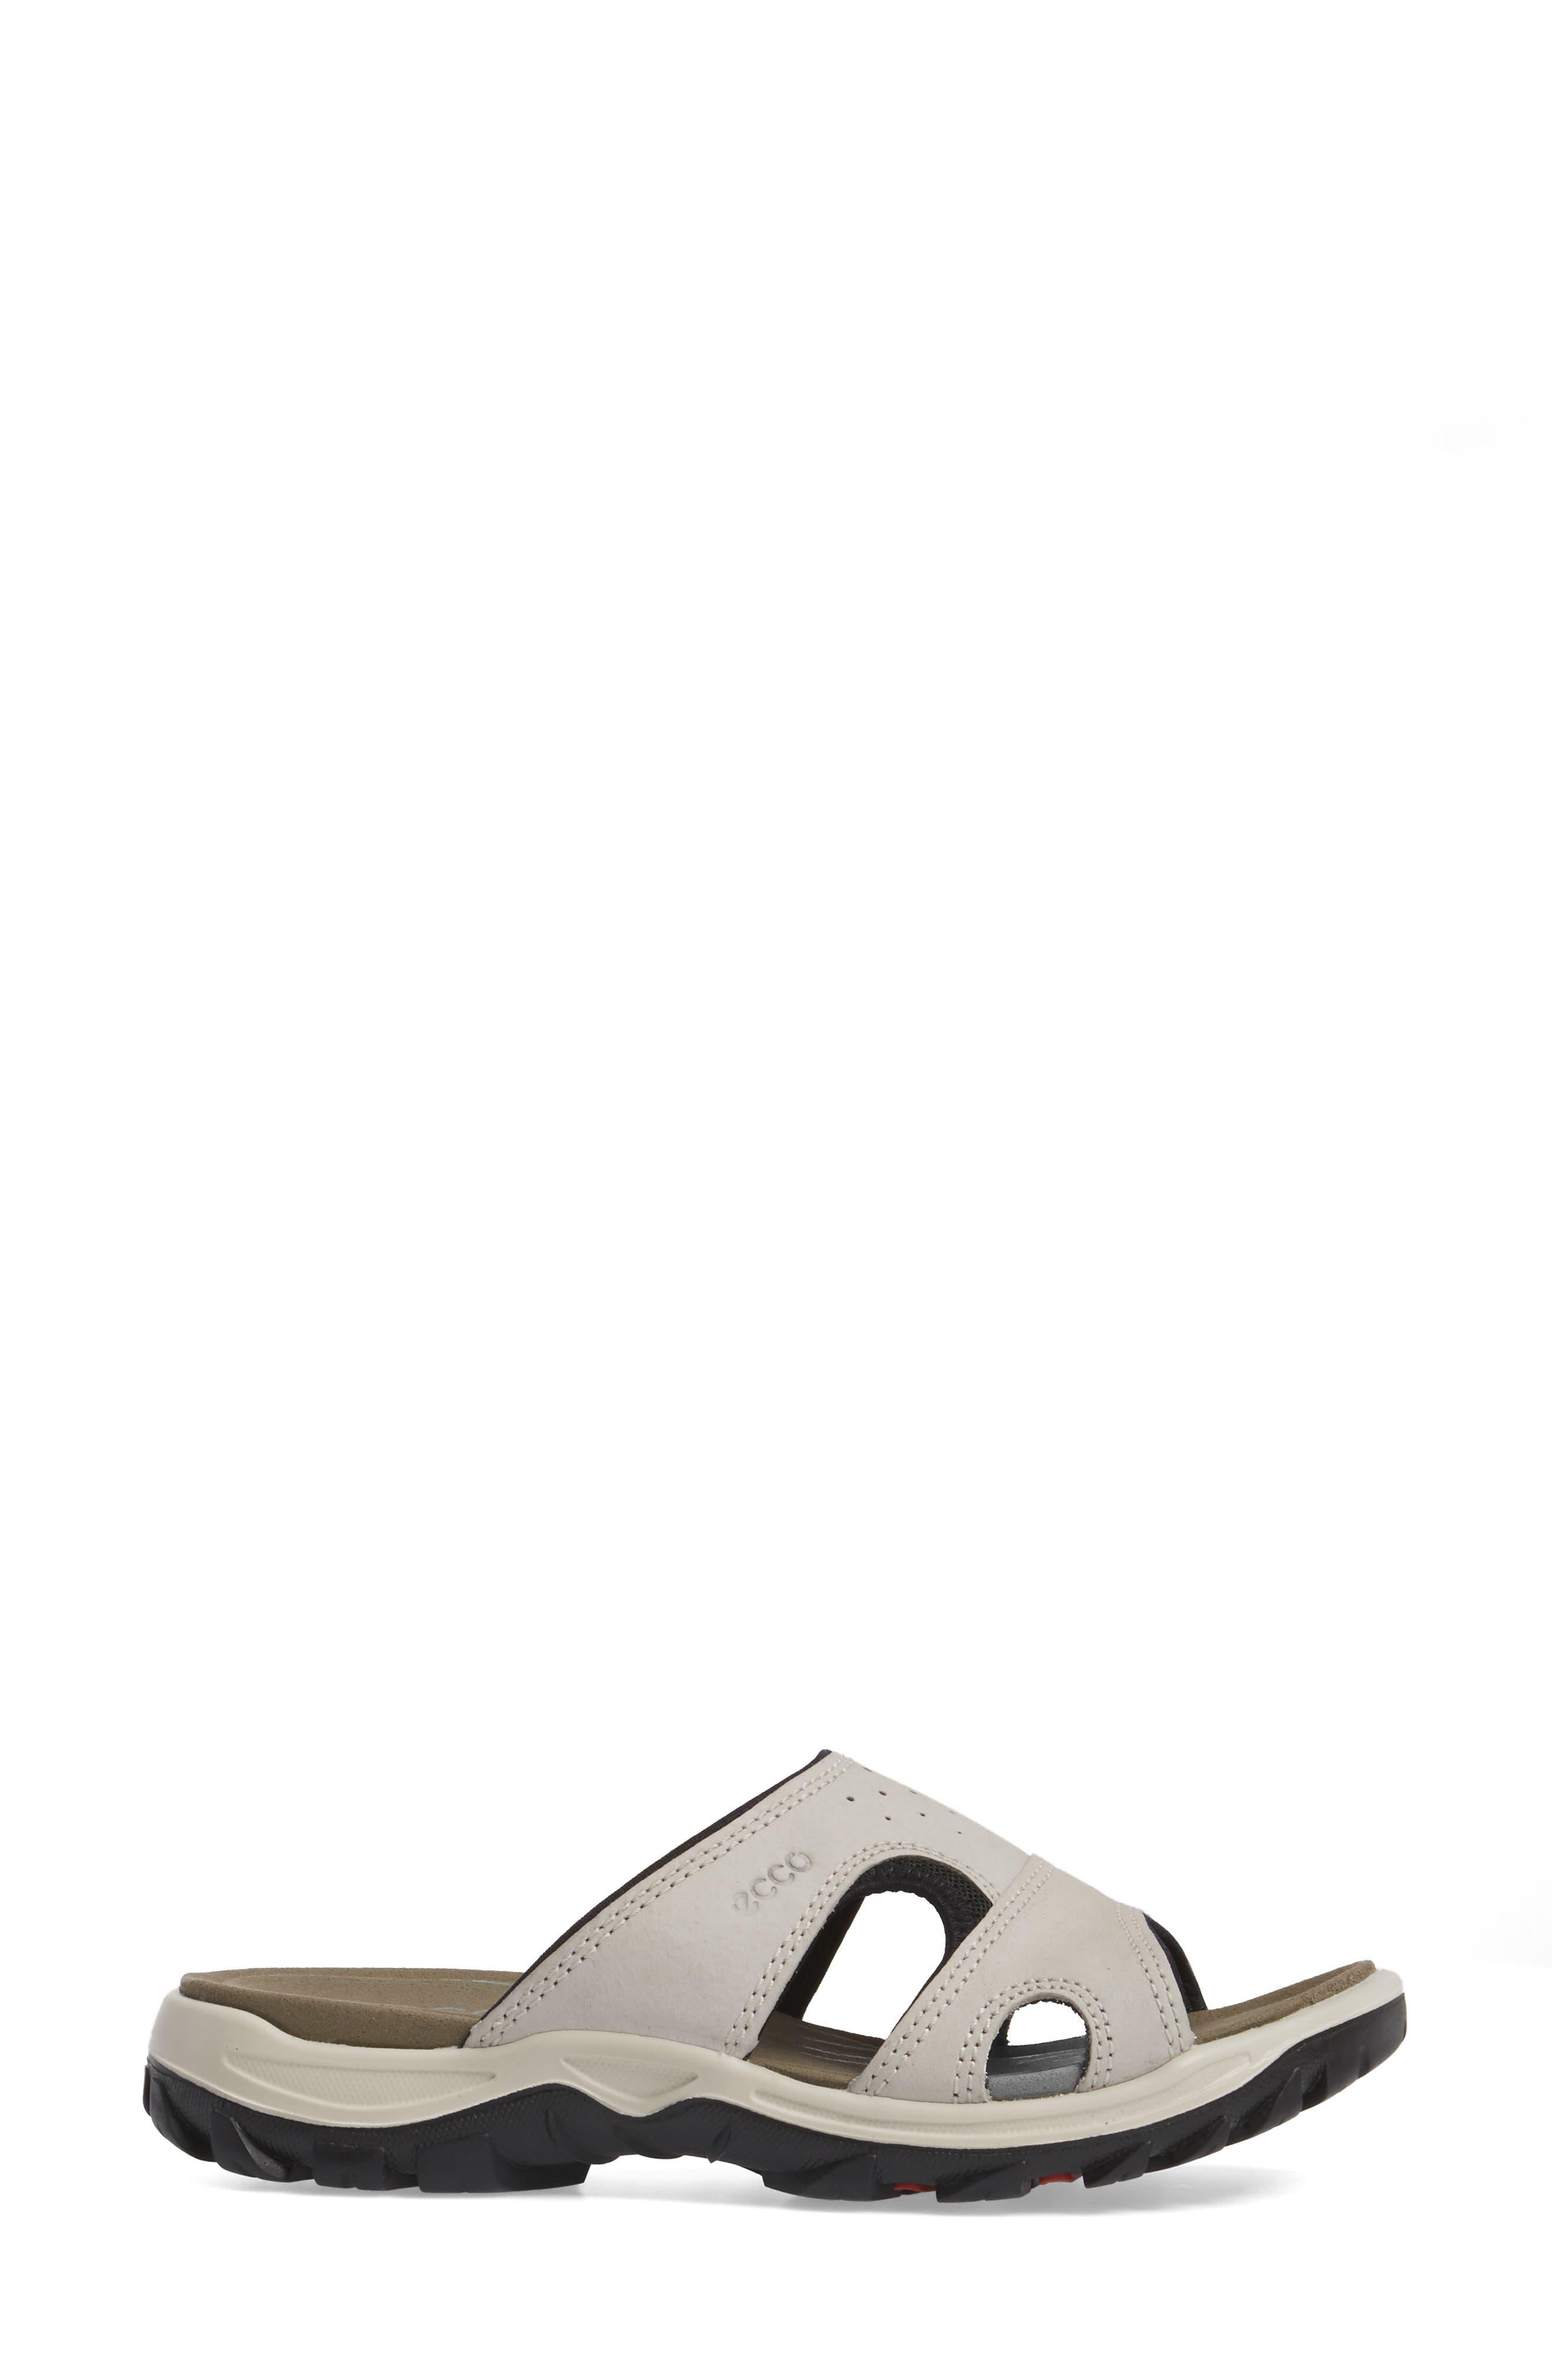 ECCO, Offroad Lite Slide Sandal, Alternate thumbnail 3, color, GRAVEL/ BLACK LEATHER